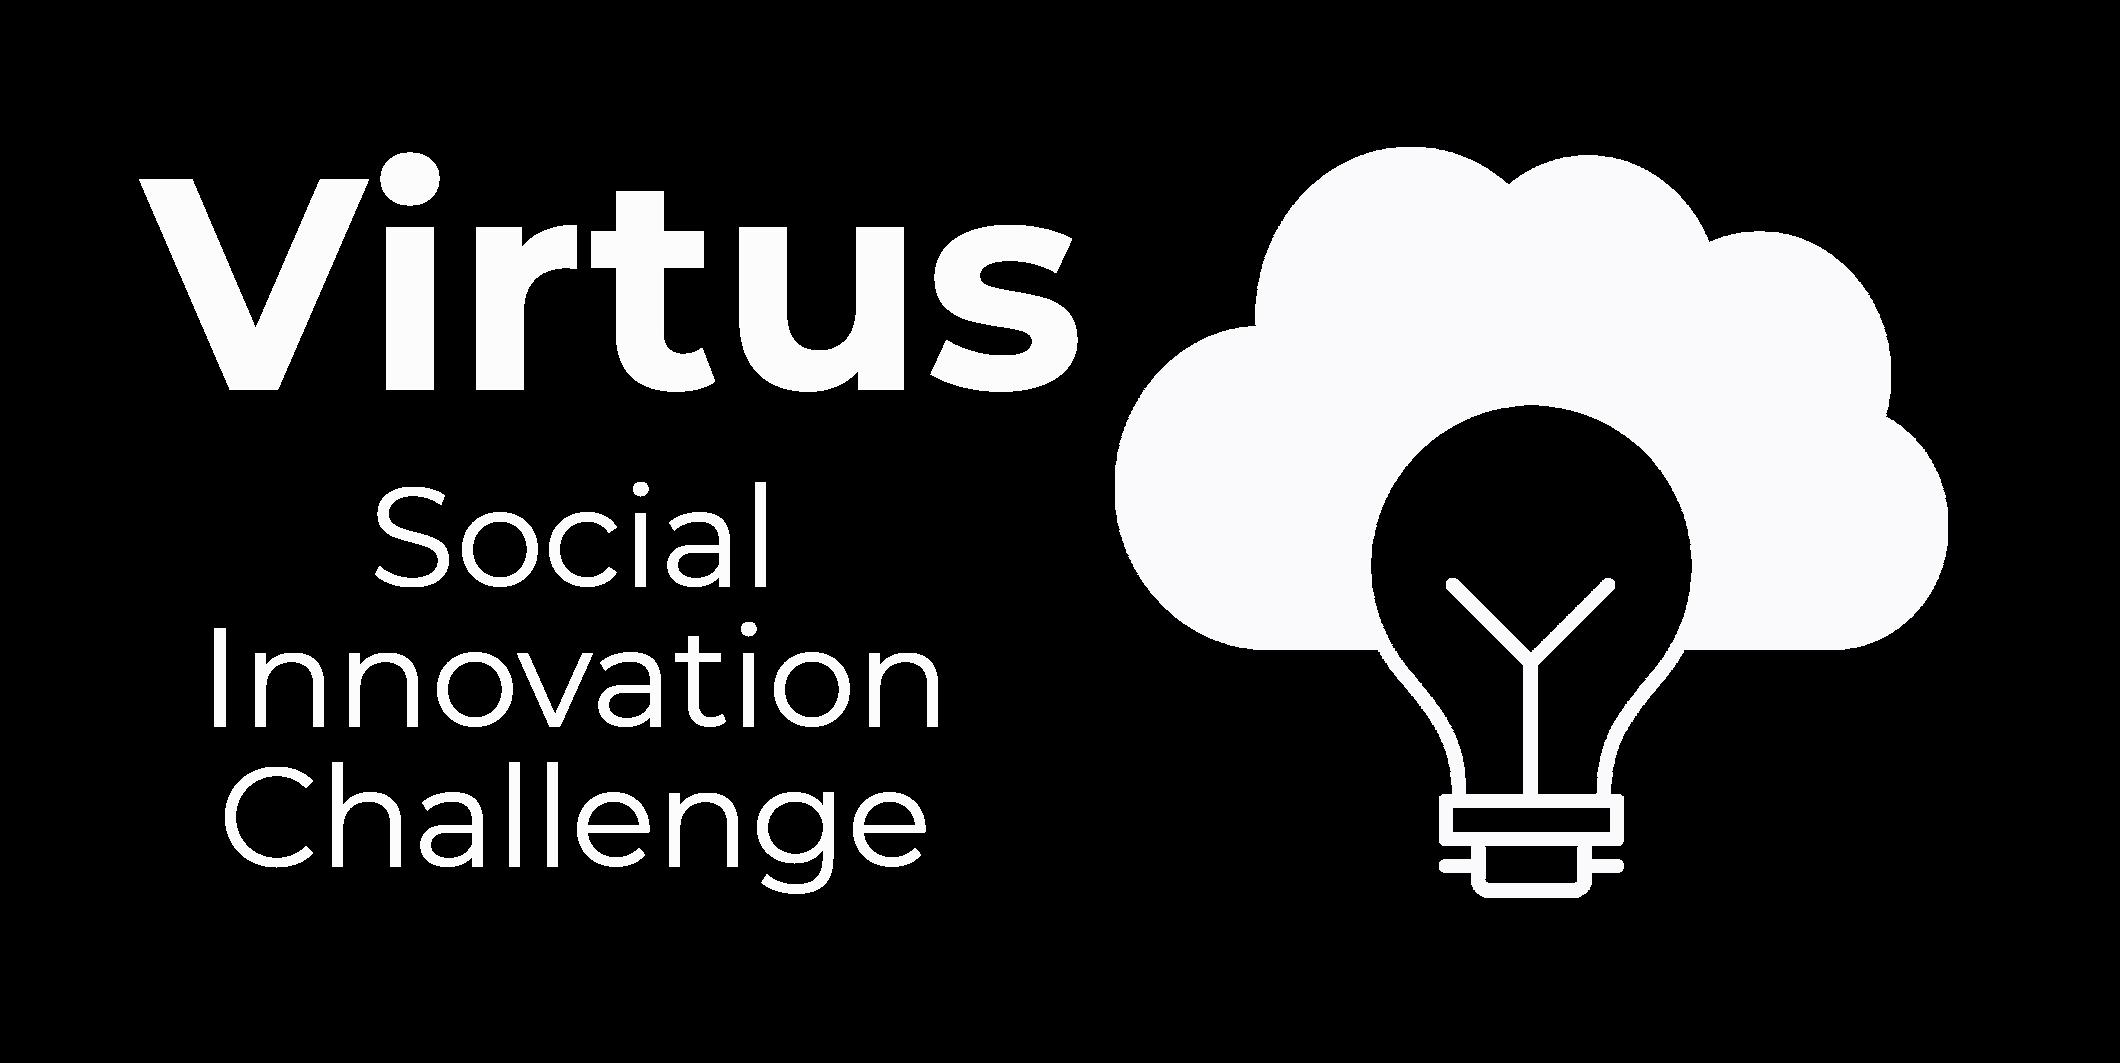 virtus-social-innovation-challenge